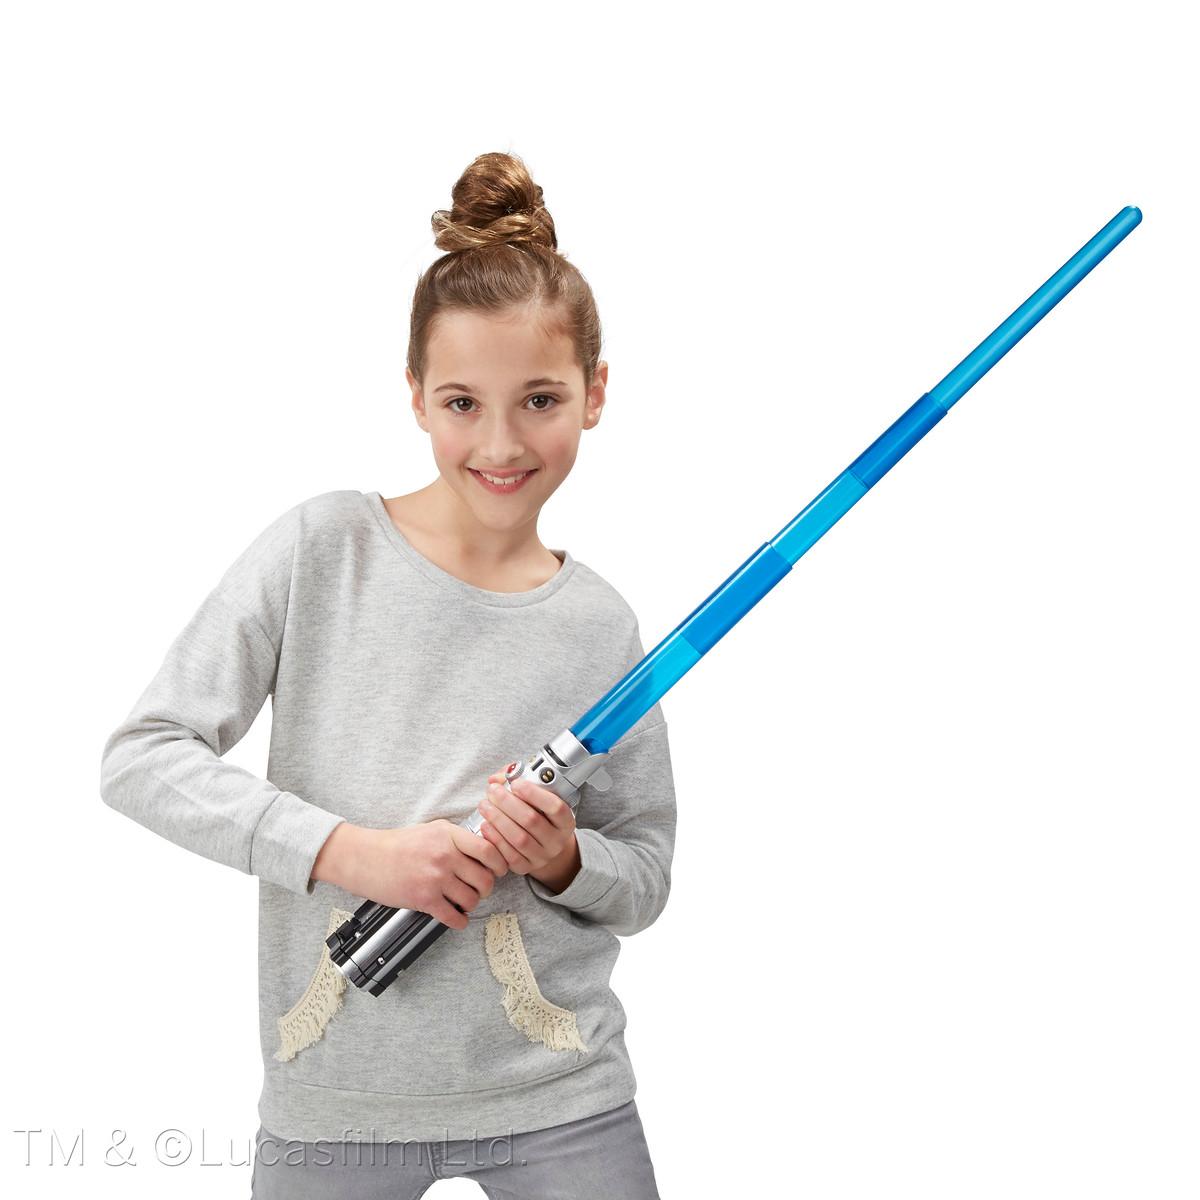 star wars toys 3